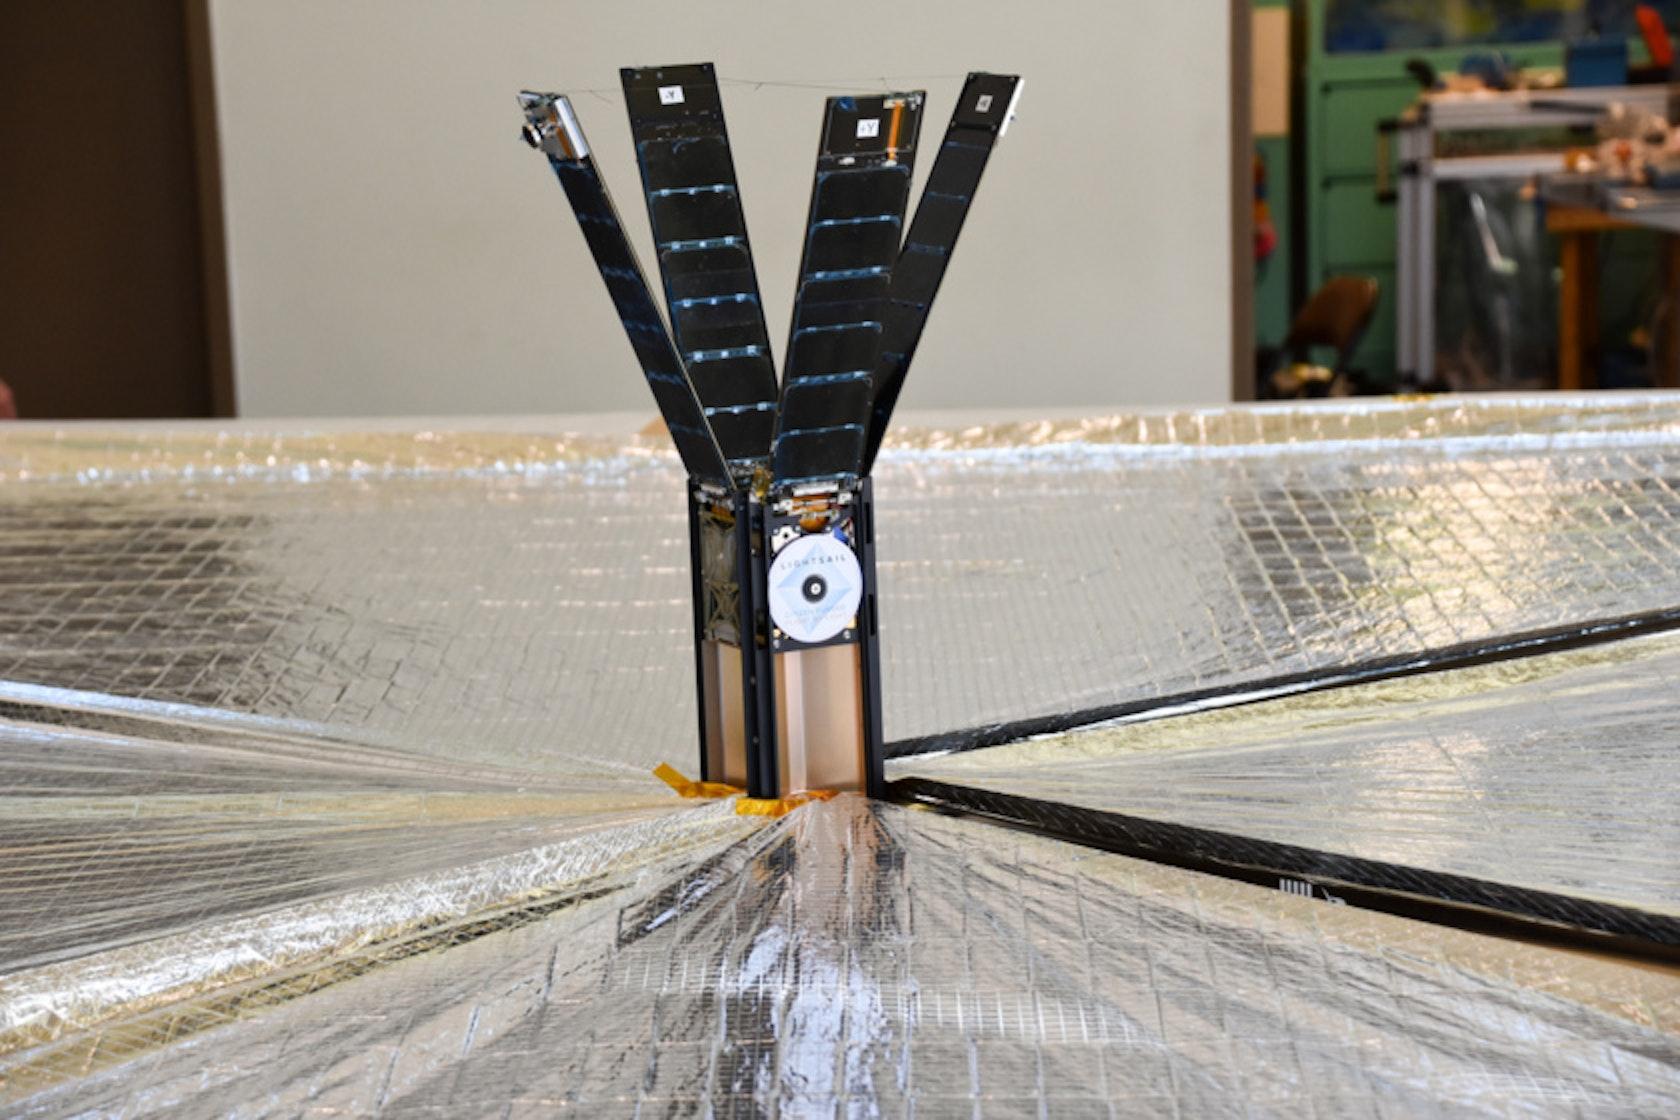 LightSail-2 unfurls its solar sails during testing.